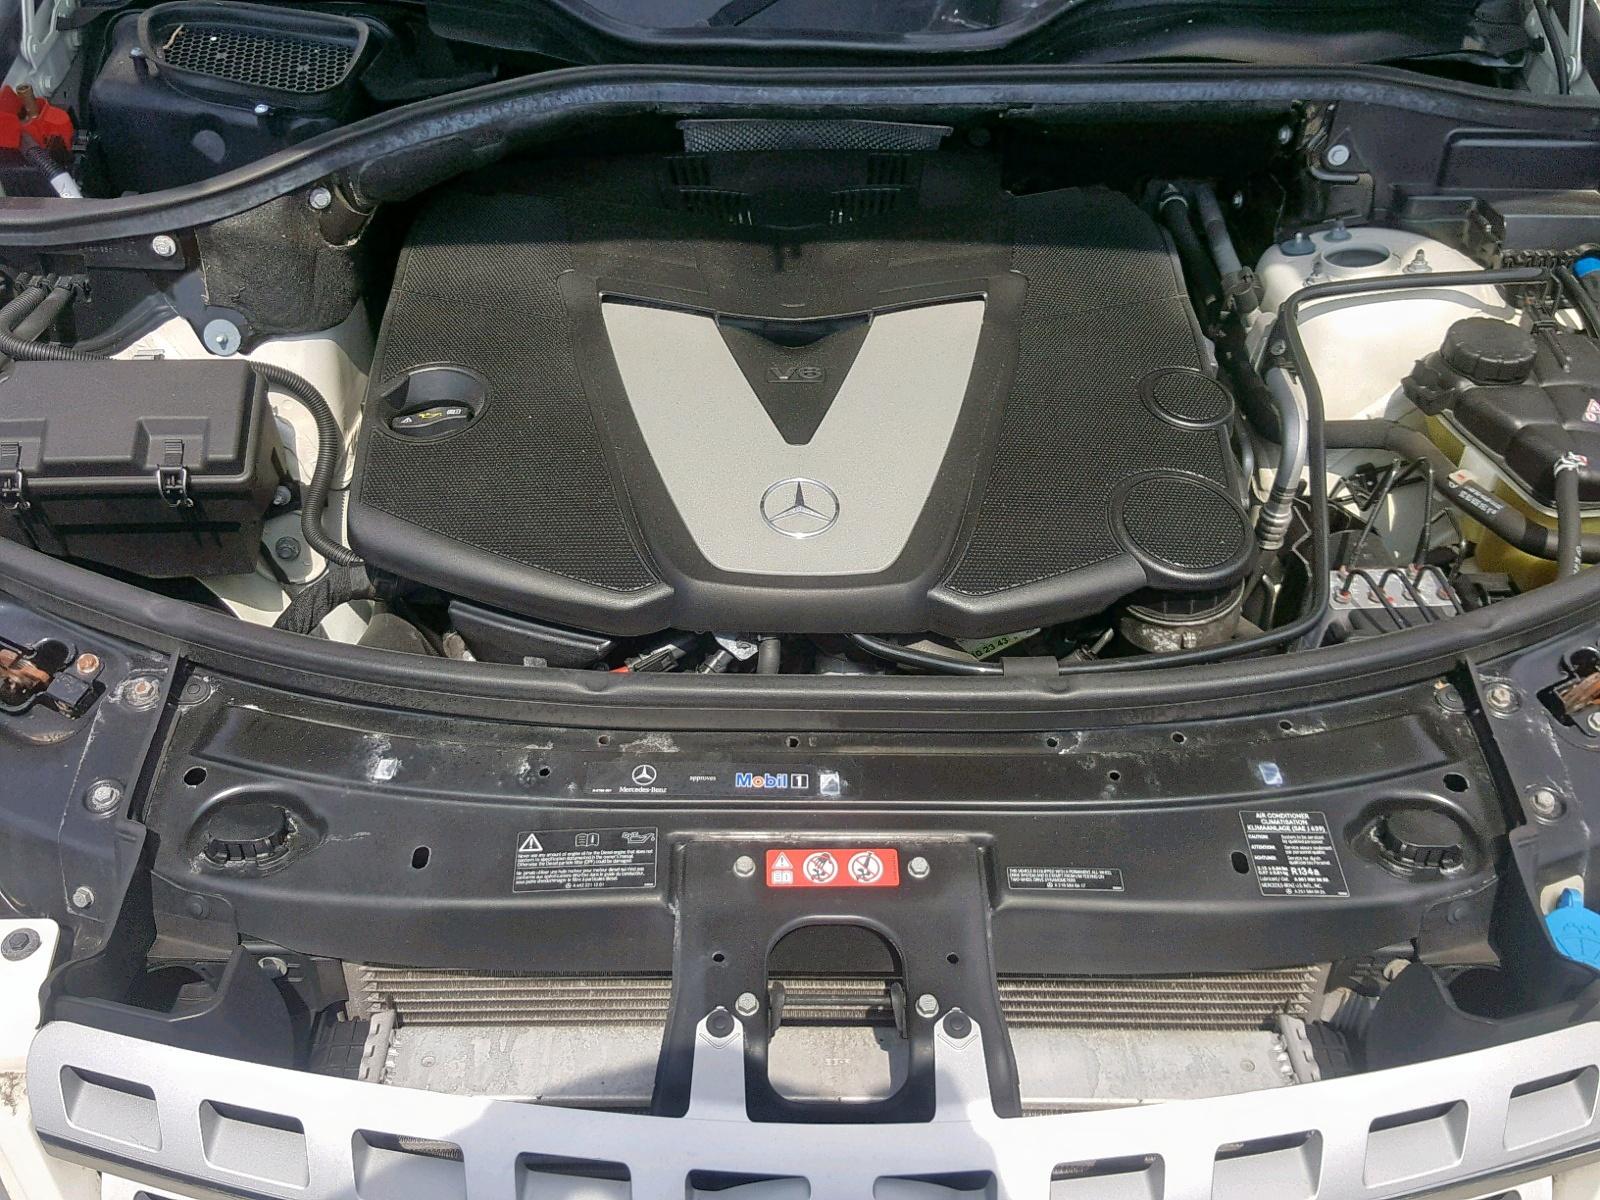 4JGBB2FB0BA648633 - 2011 Mercedes-Benz Ml 350 Blu 3.0L inside view